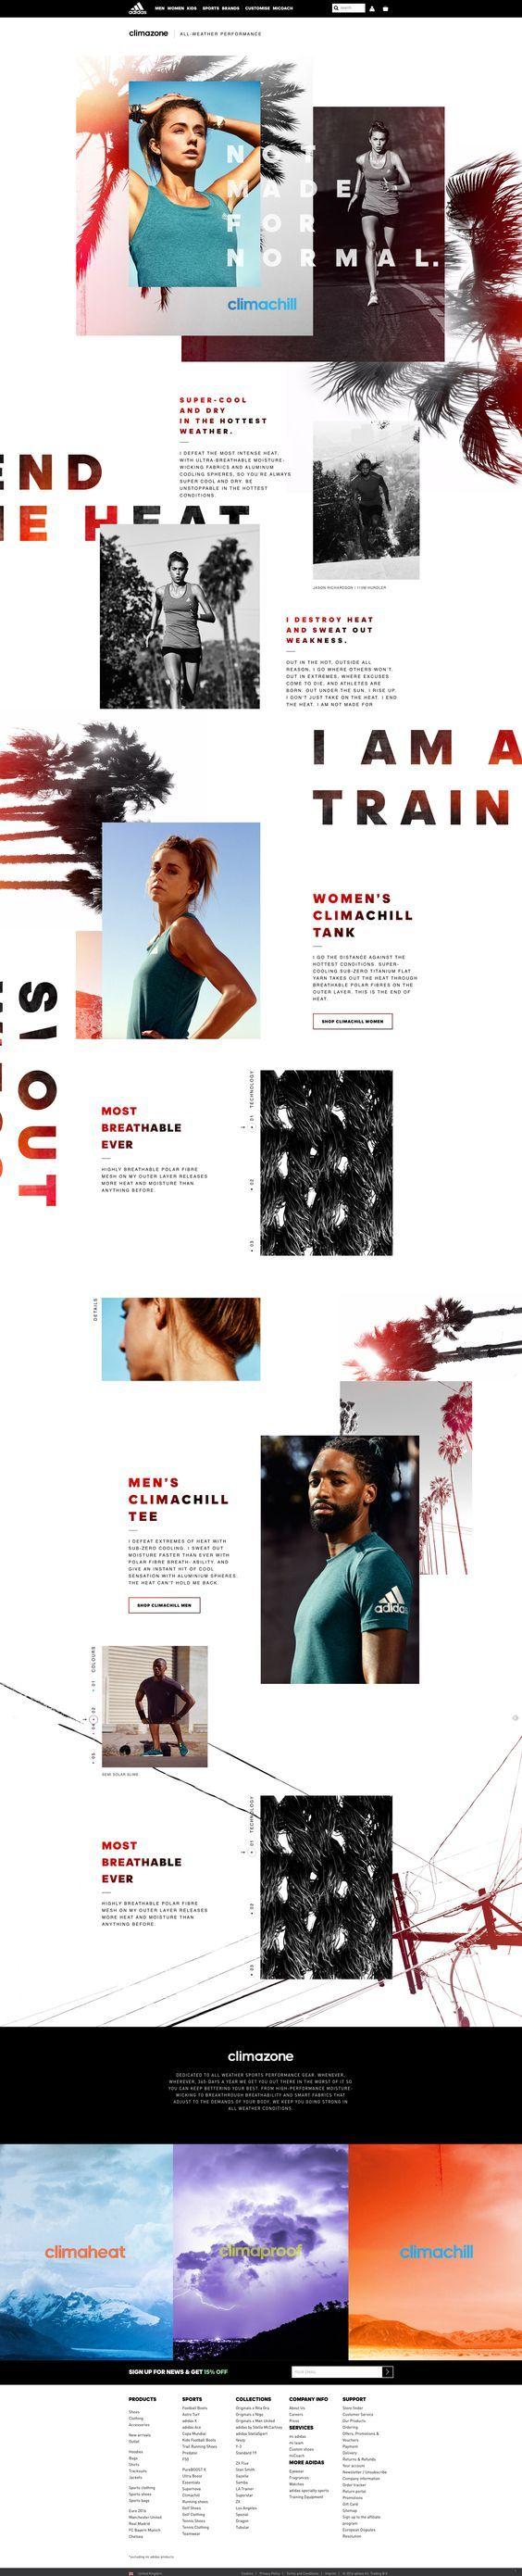 Adidas Web Design | Fivestar Branding – Design and Branding Agency & Inspiration Gallery